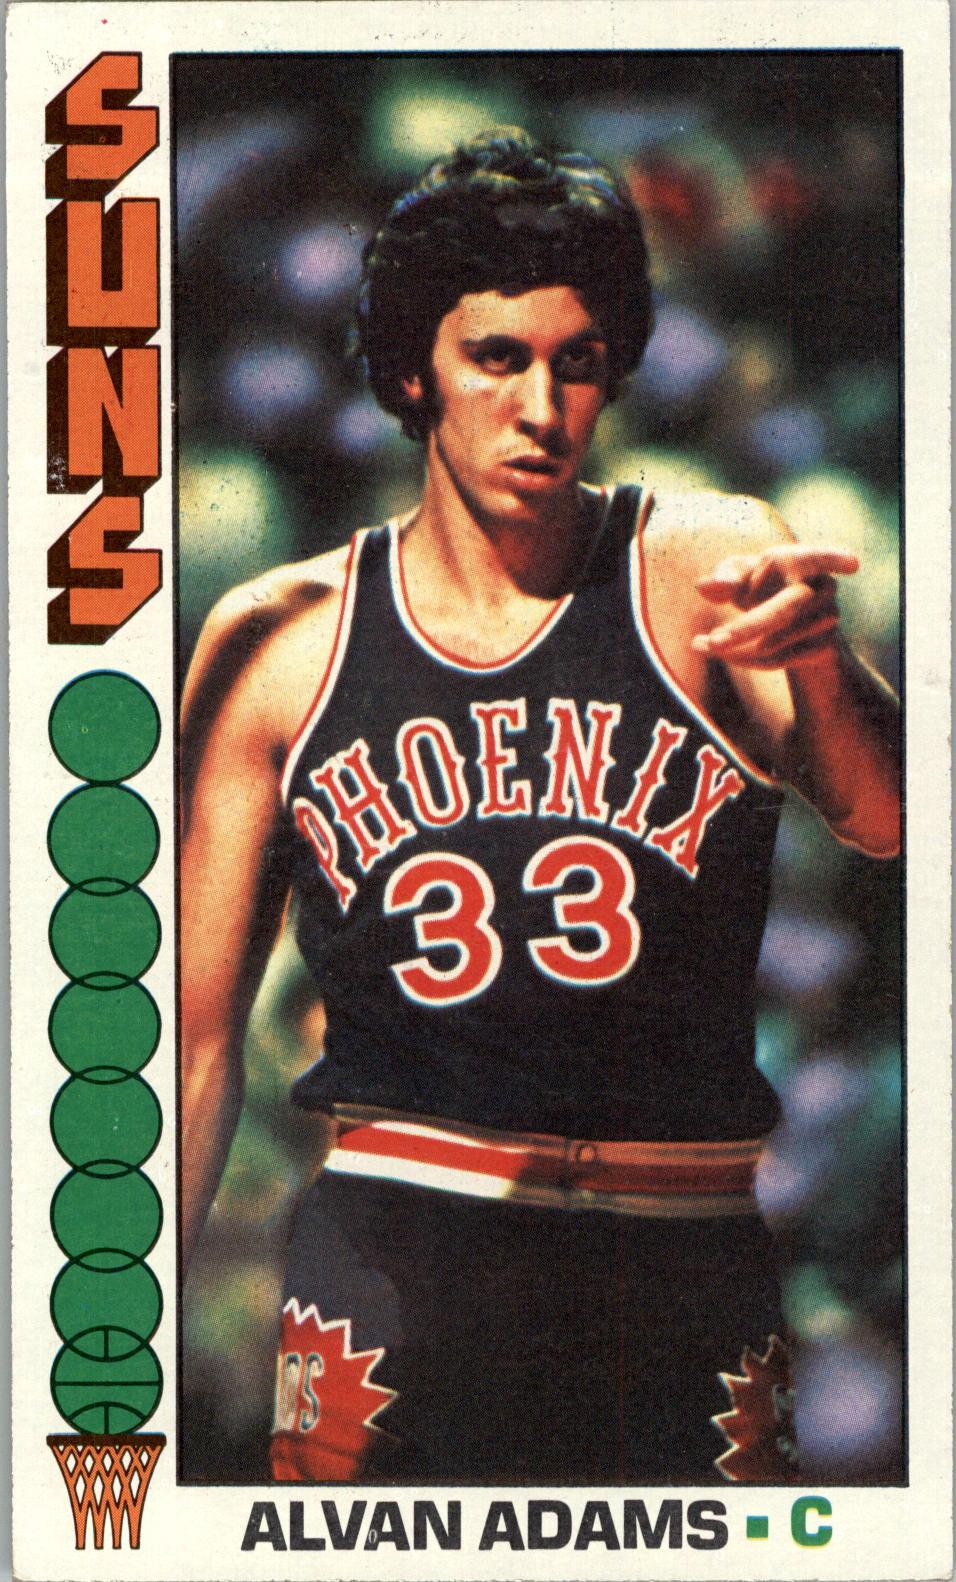 1976-77 Topps #75 Alvan Adams RC